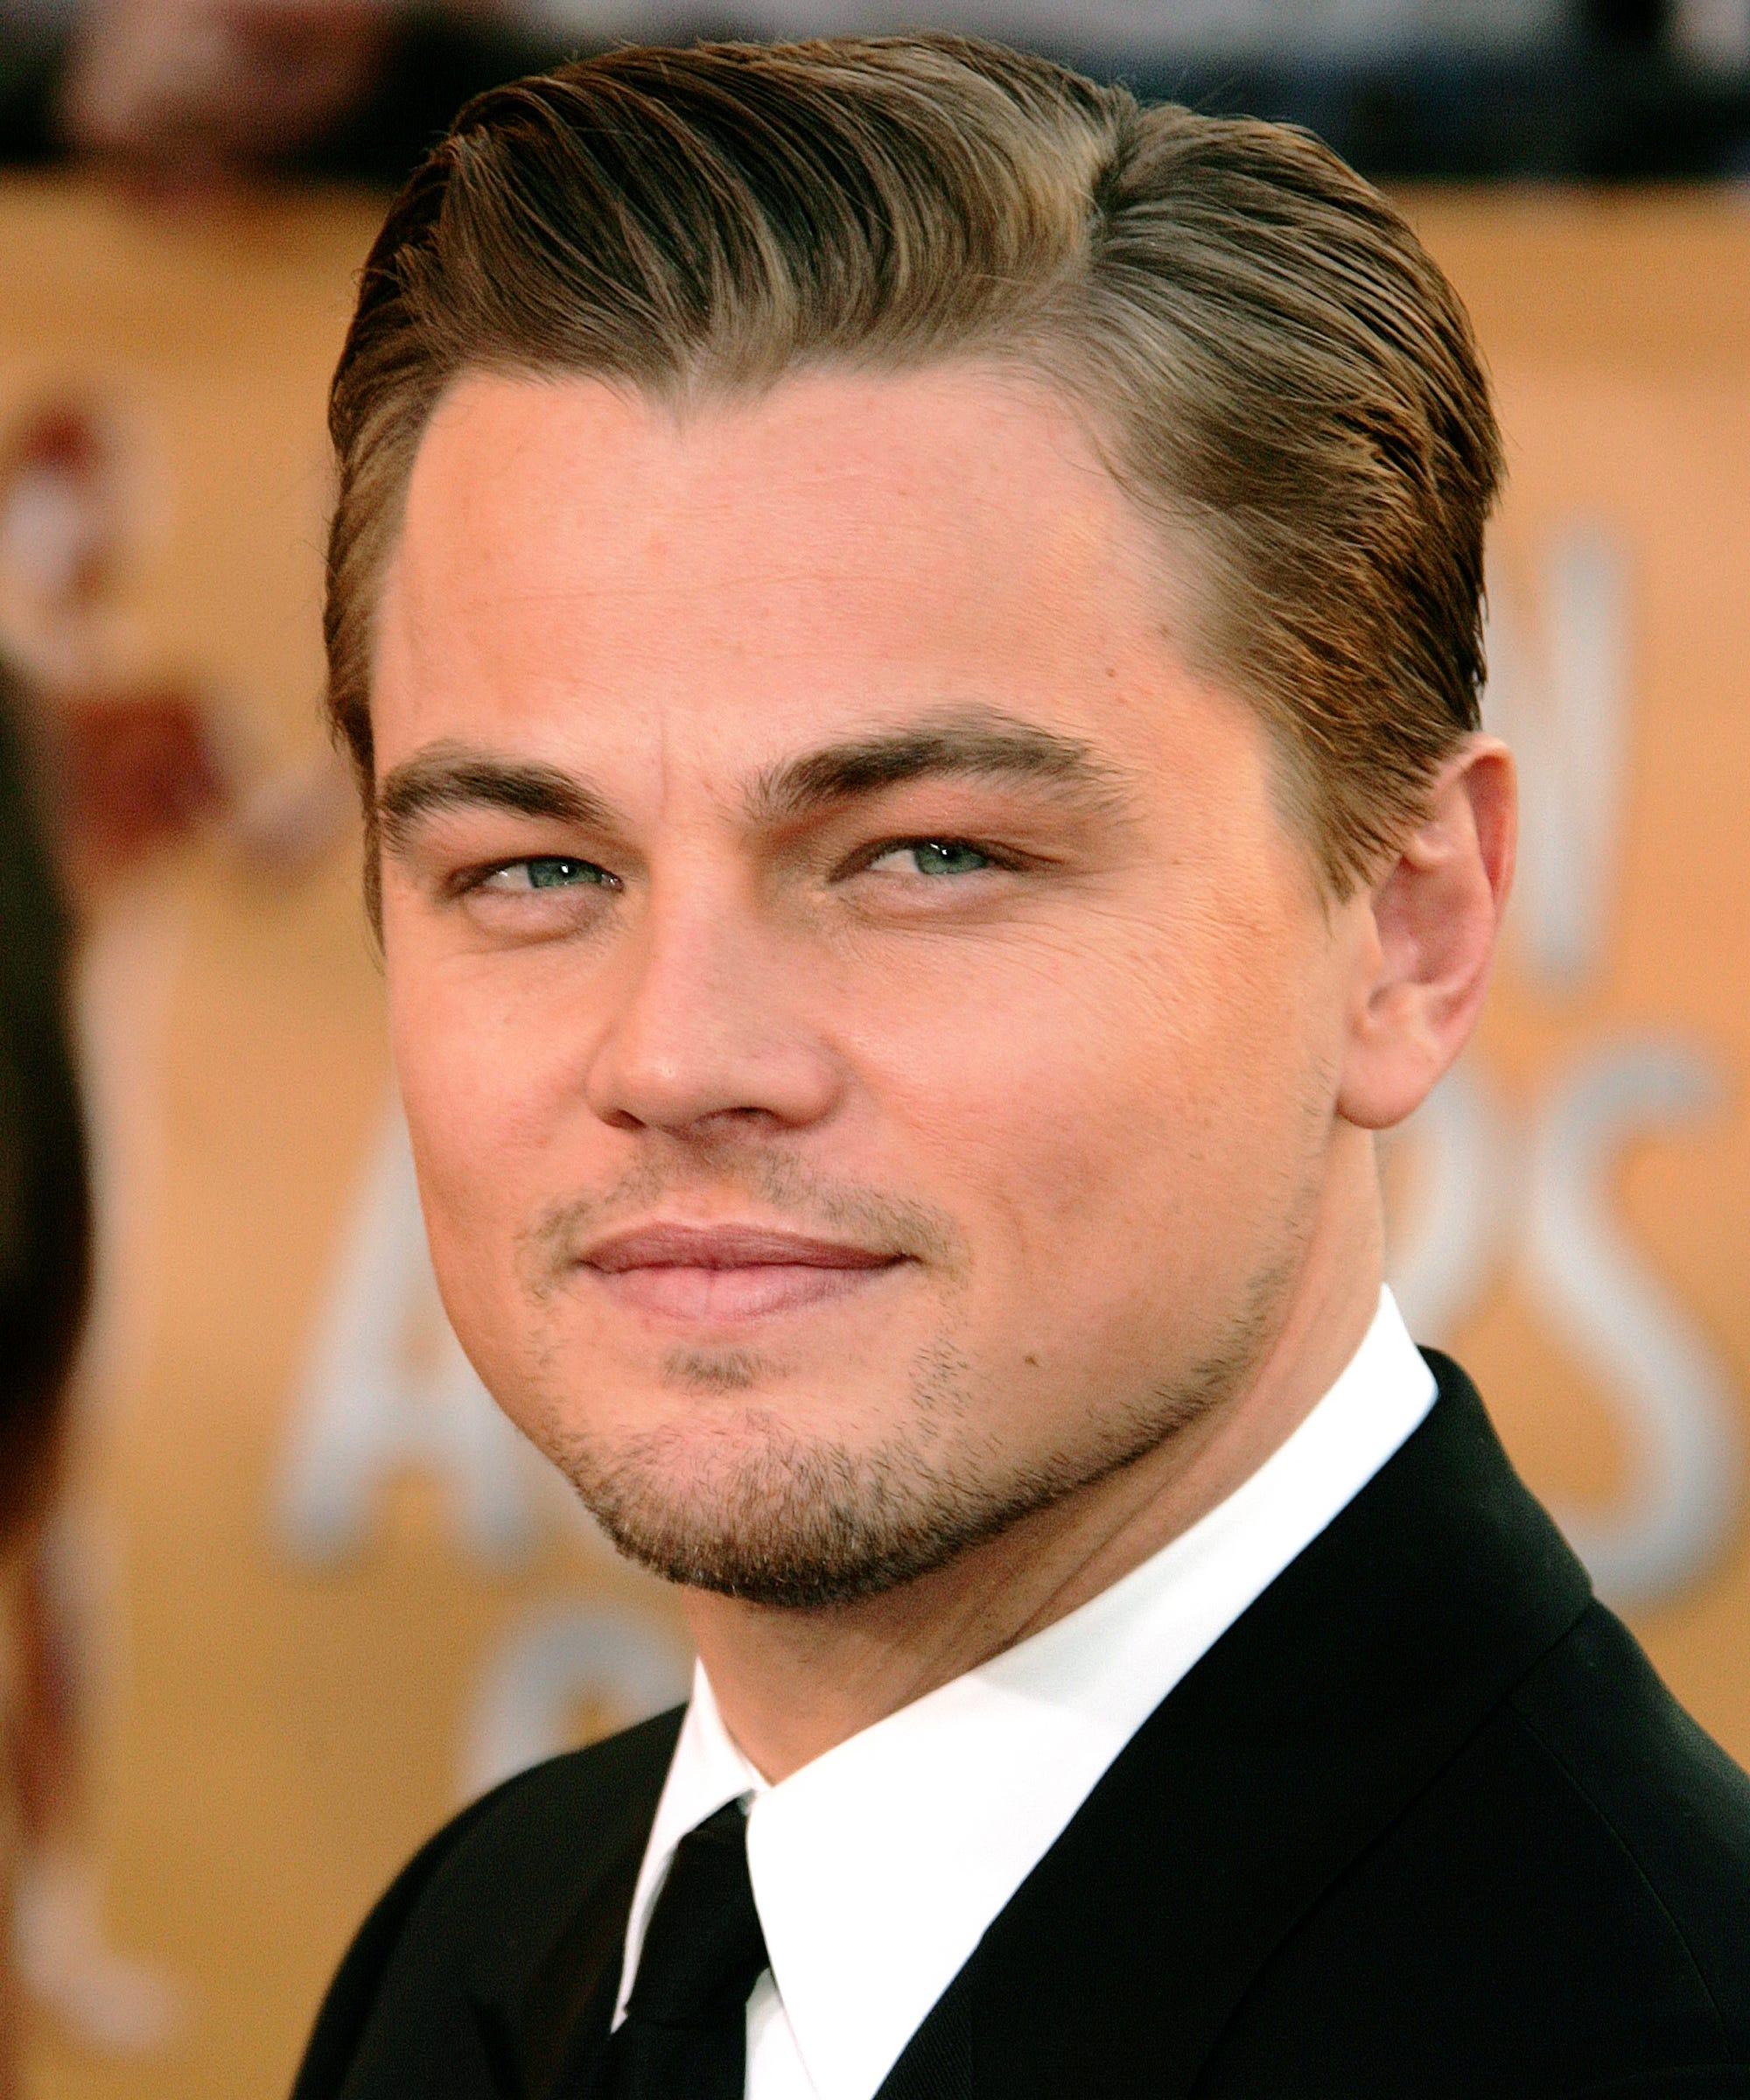 Leonardo Dicaprio Hair Style Then And Now Photos